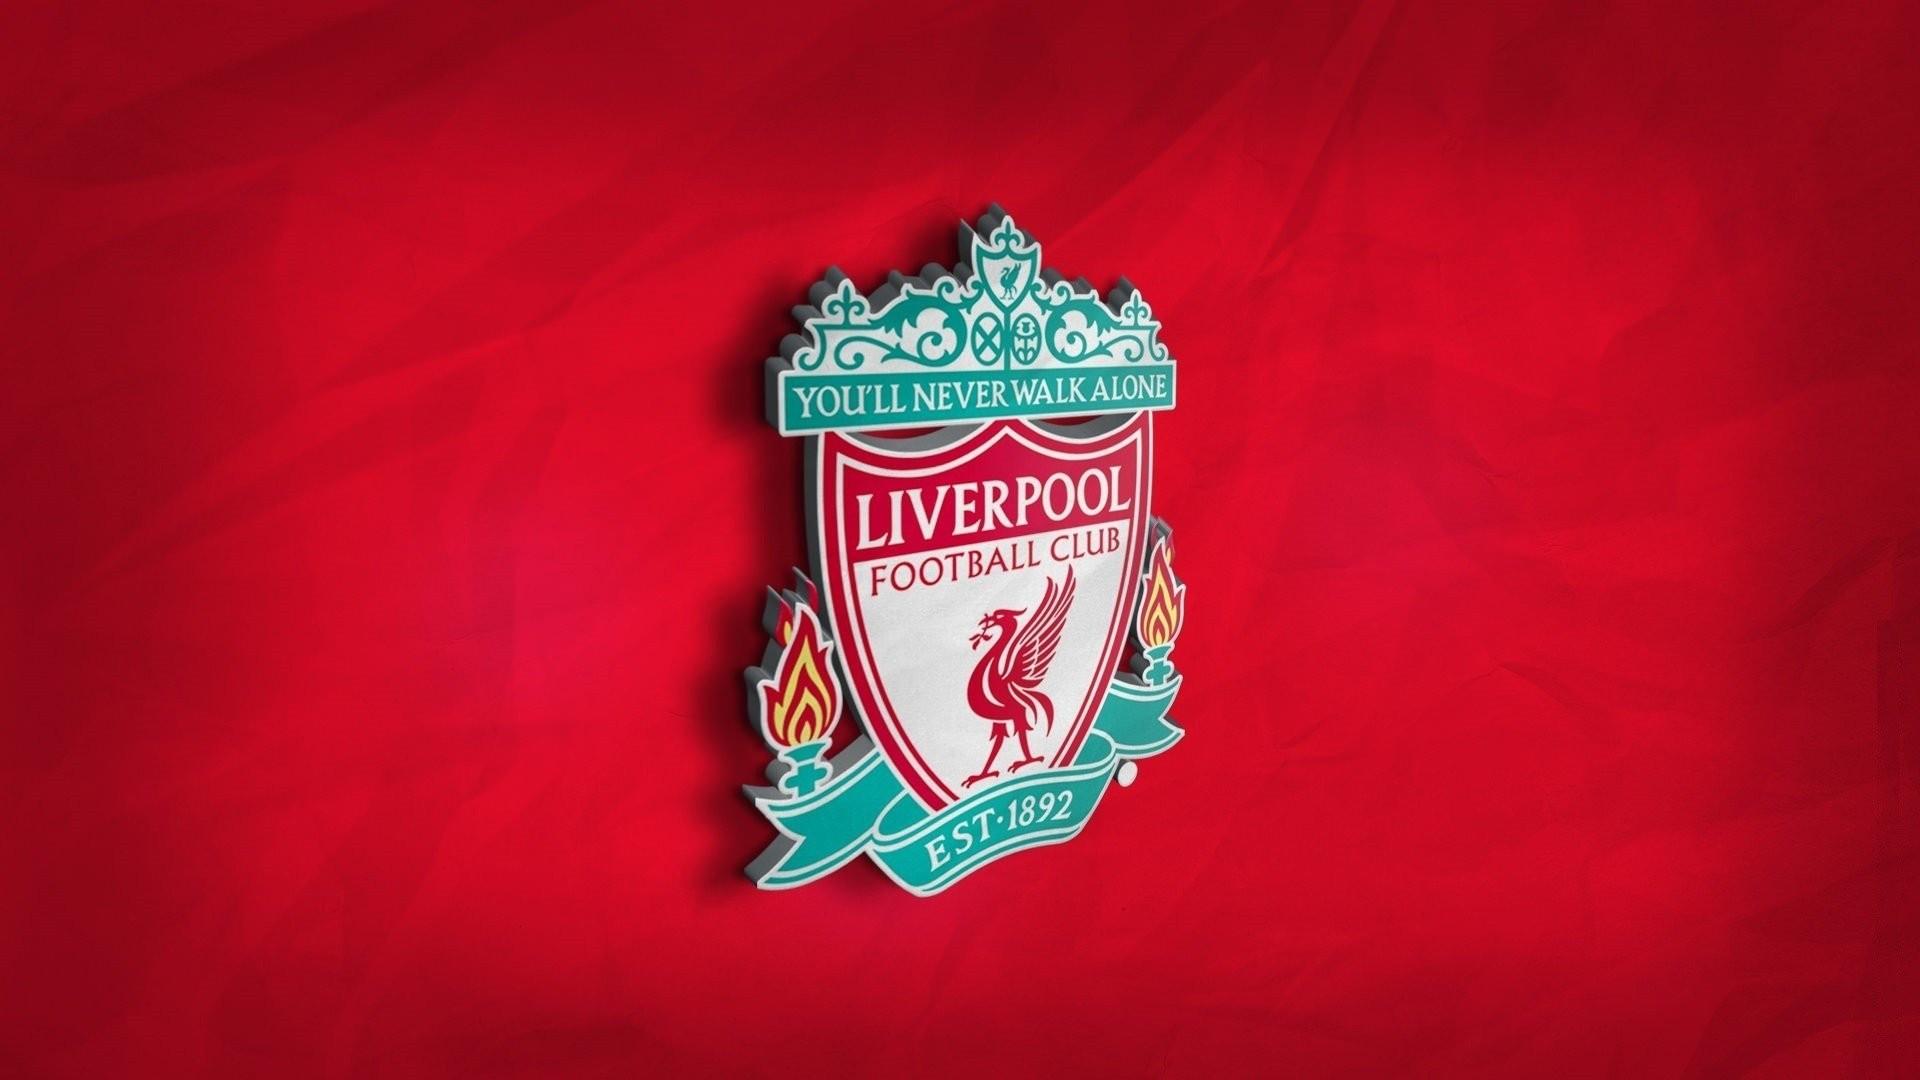 Liverpool Free Wallpaper